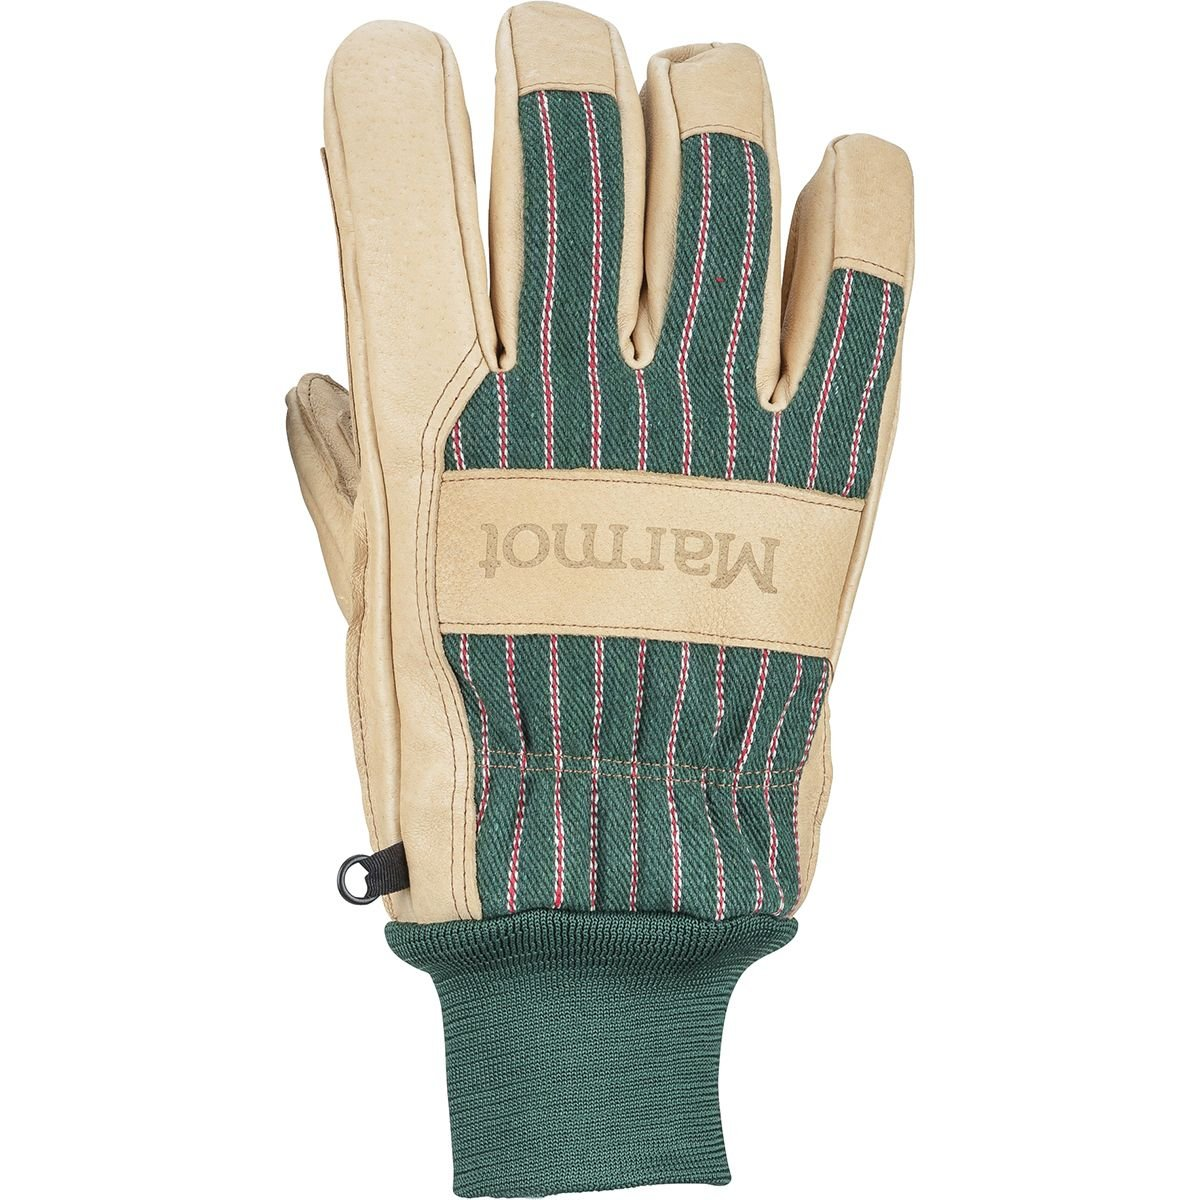 Marmot メンズ Lifty Glove - メンズ タン/フォレスト Marmot XL B07FW69ZTW B07FW69ZTW, Beyond living:3c80e7dc --- ijpba.info